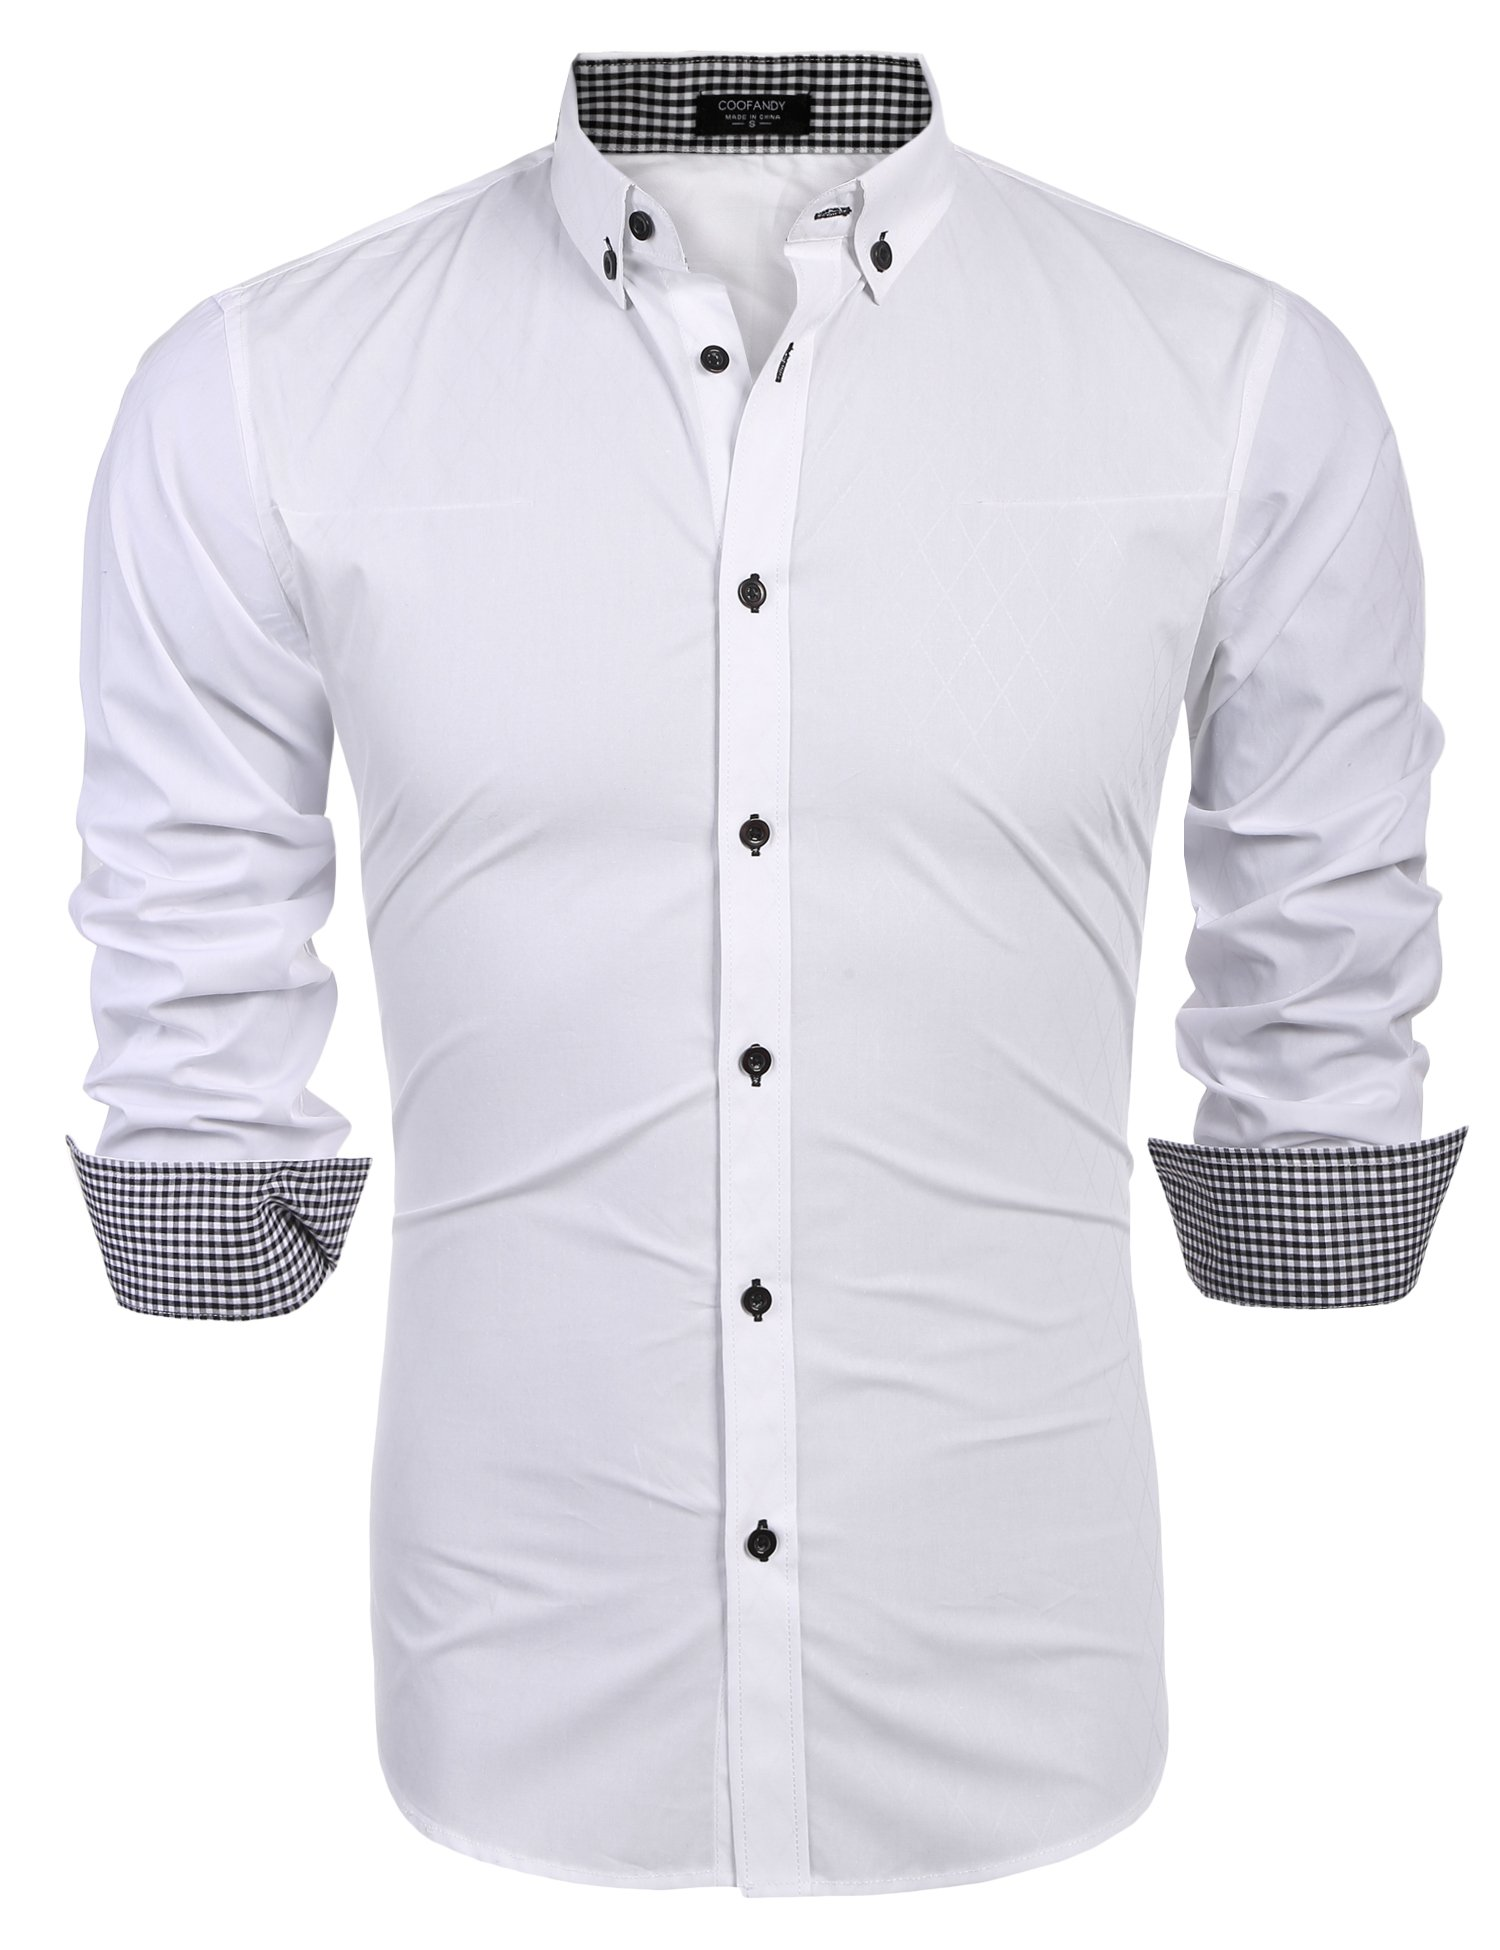 COOFANDY Men's Business Stylish Slim Fit Long Sleeve Casual Dress Shirt (L, White)